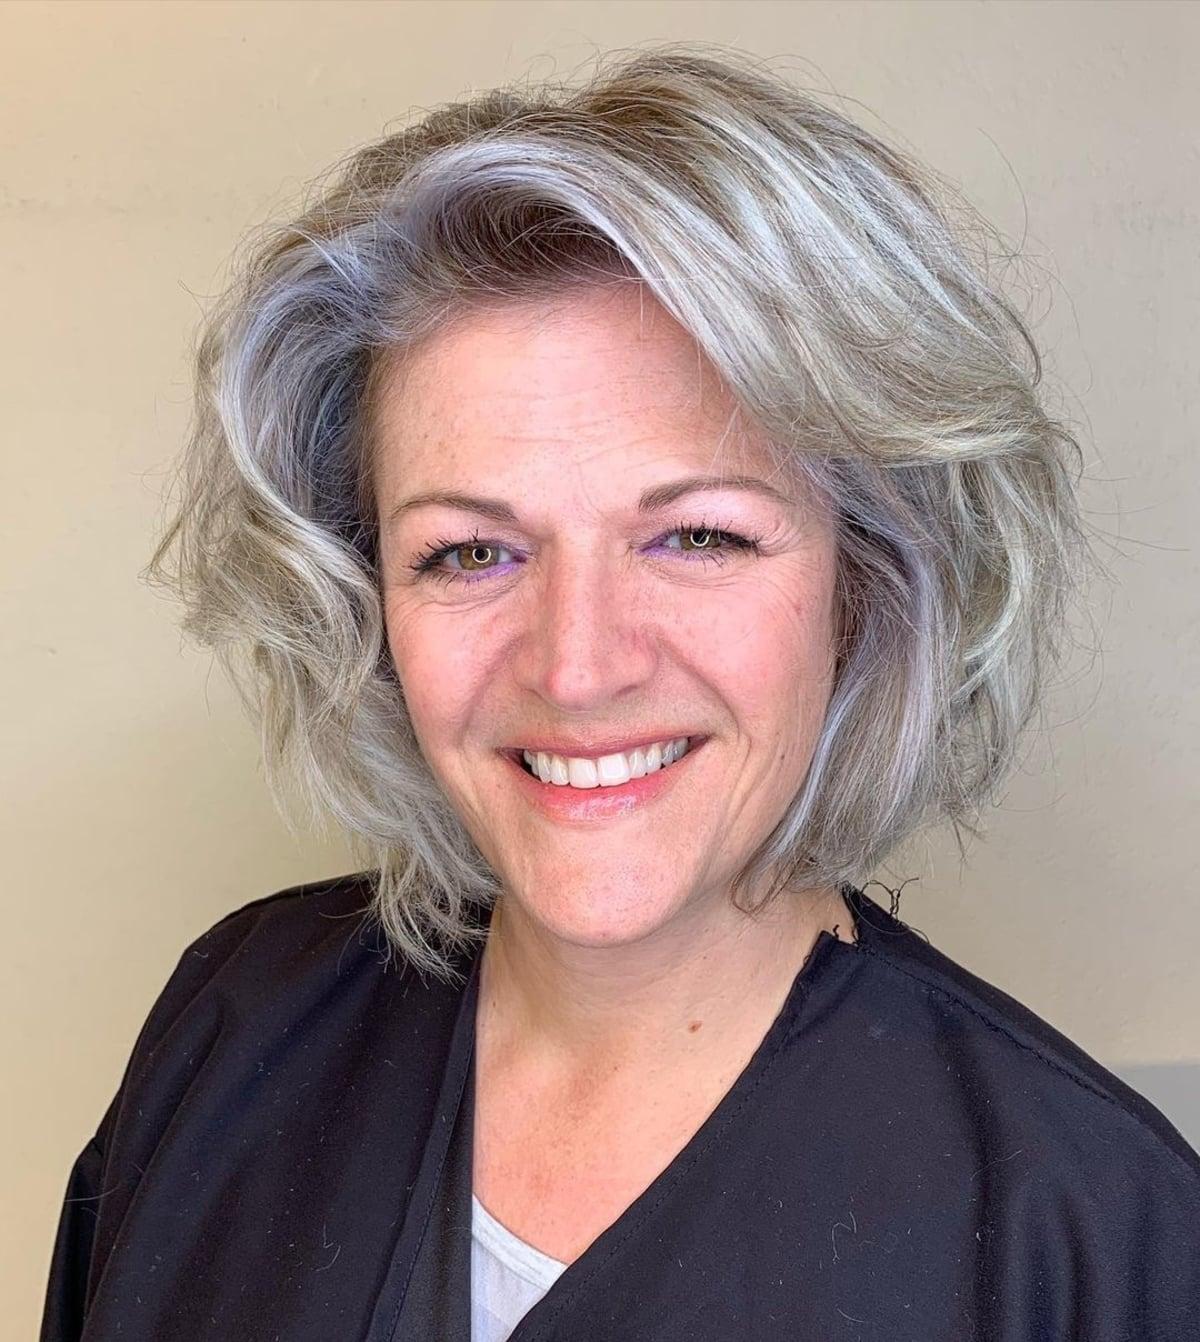 4 Flattering Short Haircuts for Older Women in 4